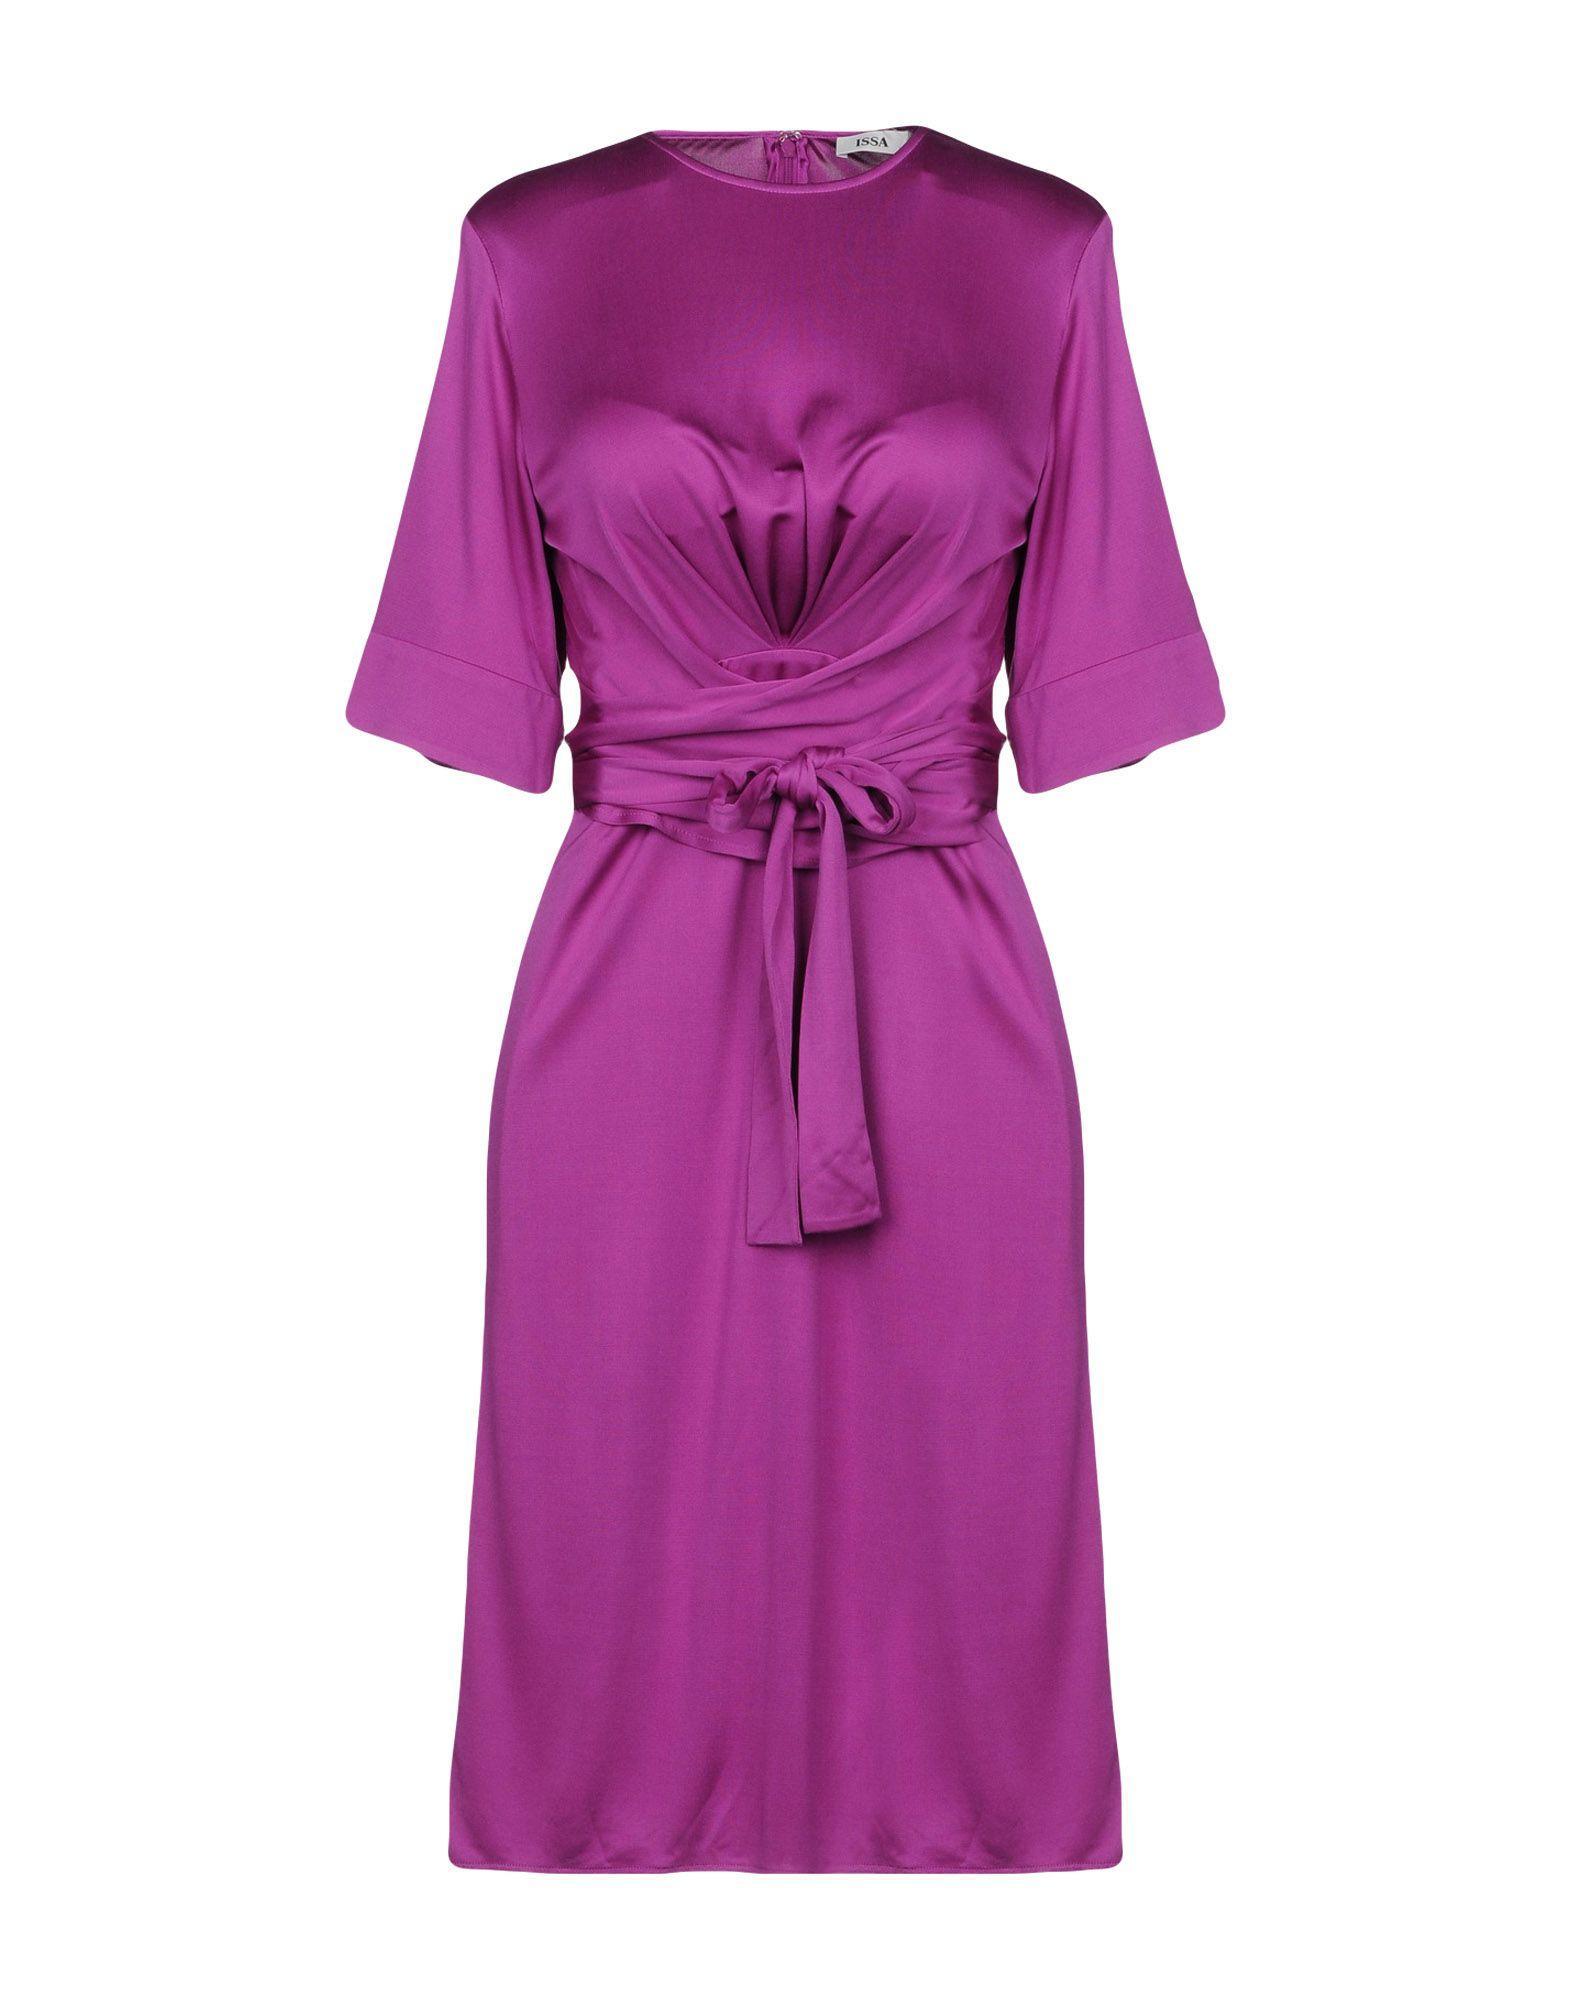 Issa Short Dresses In Mauve